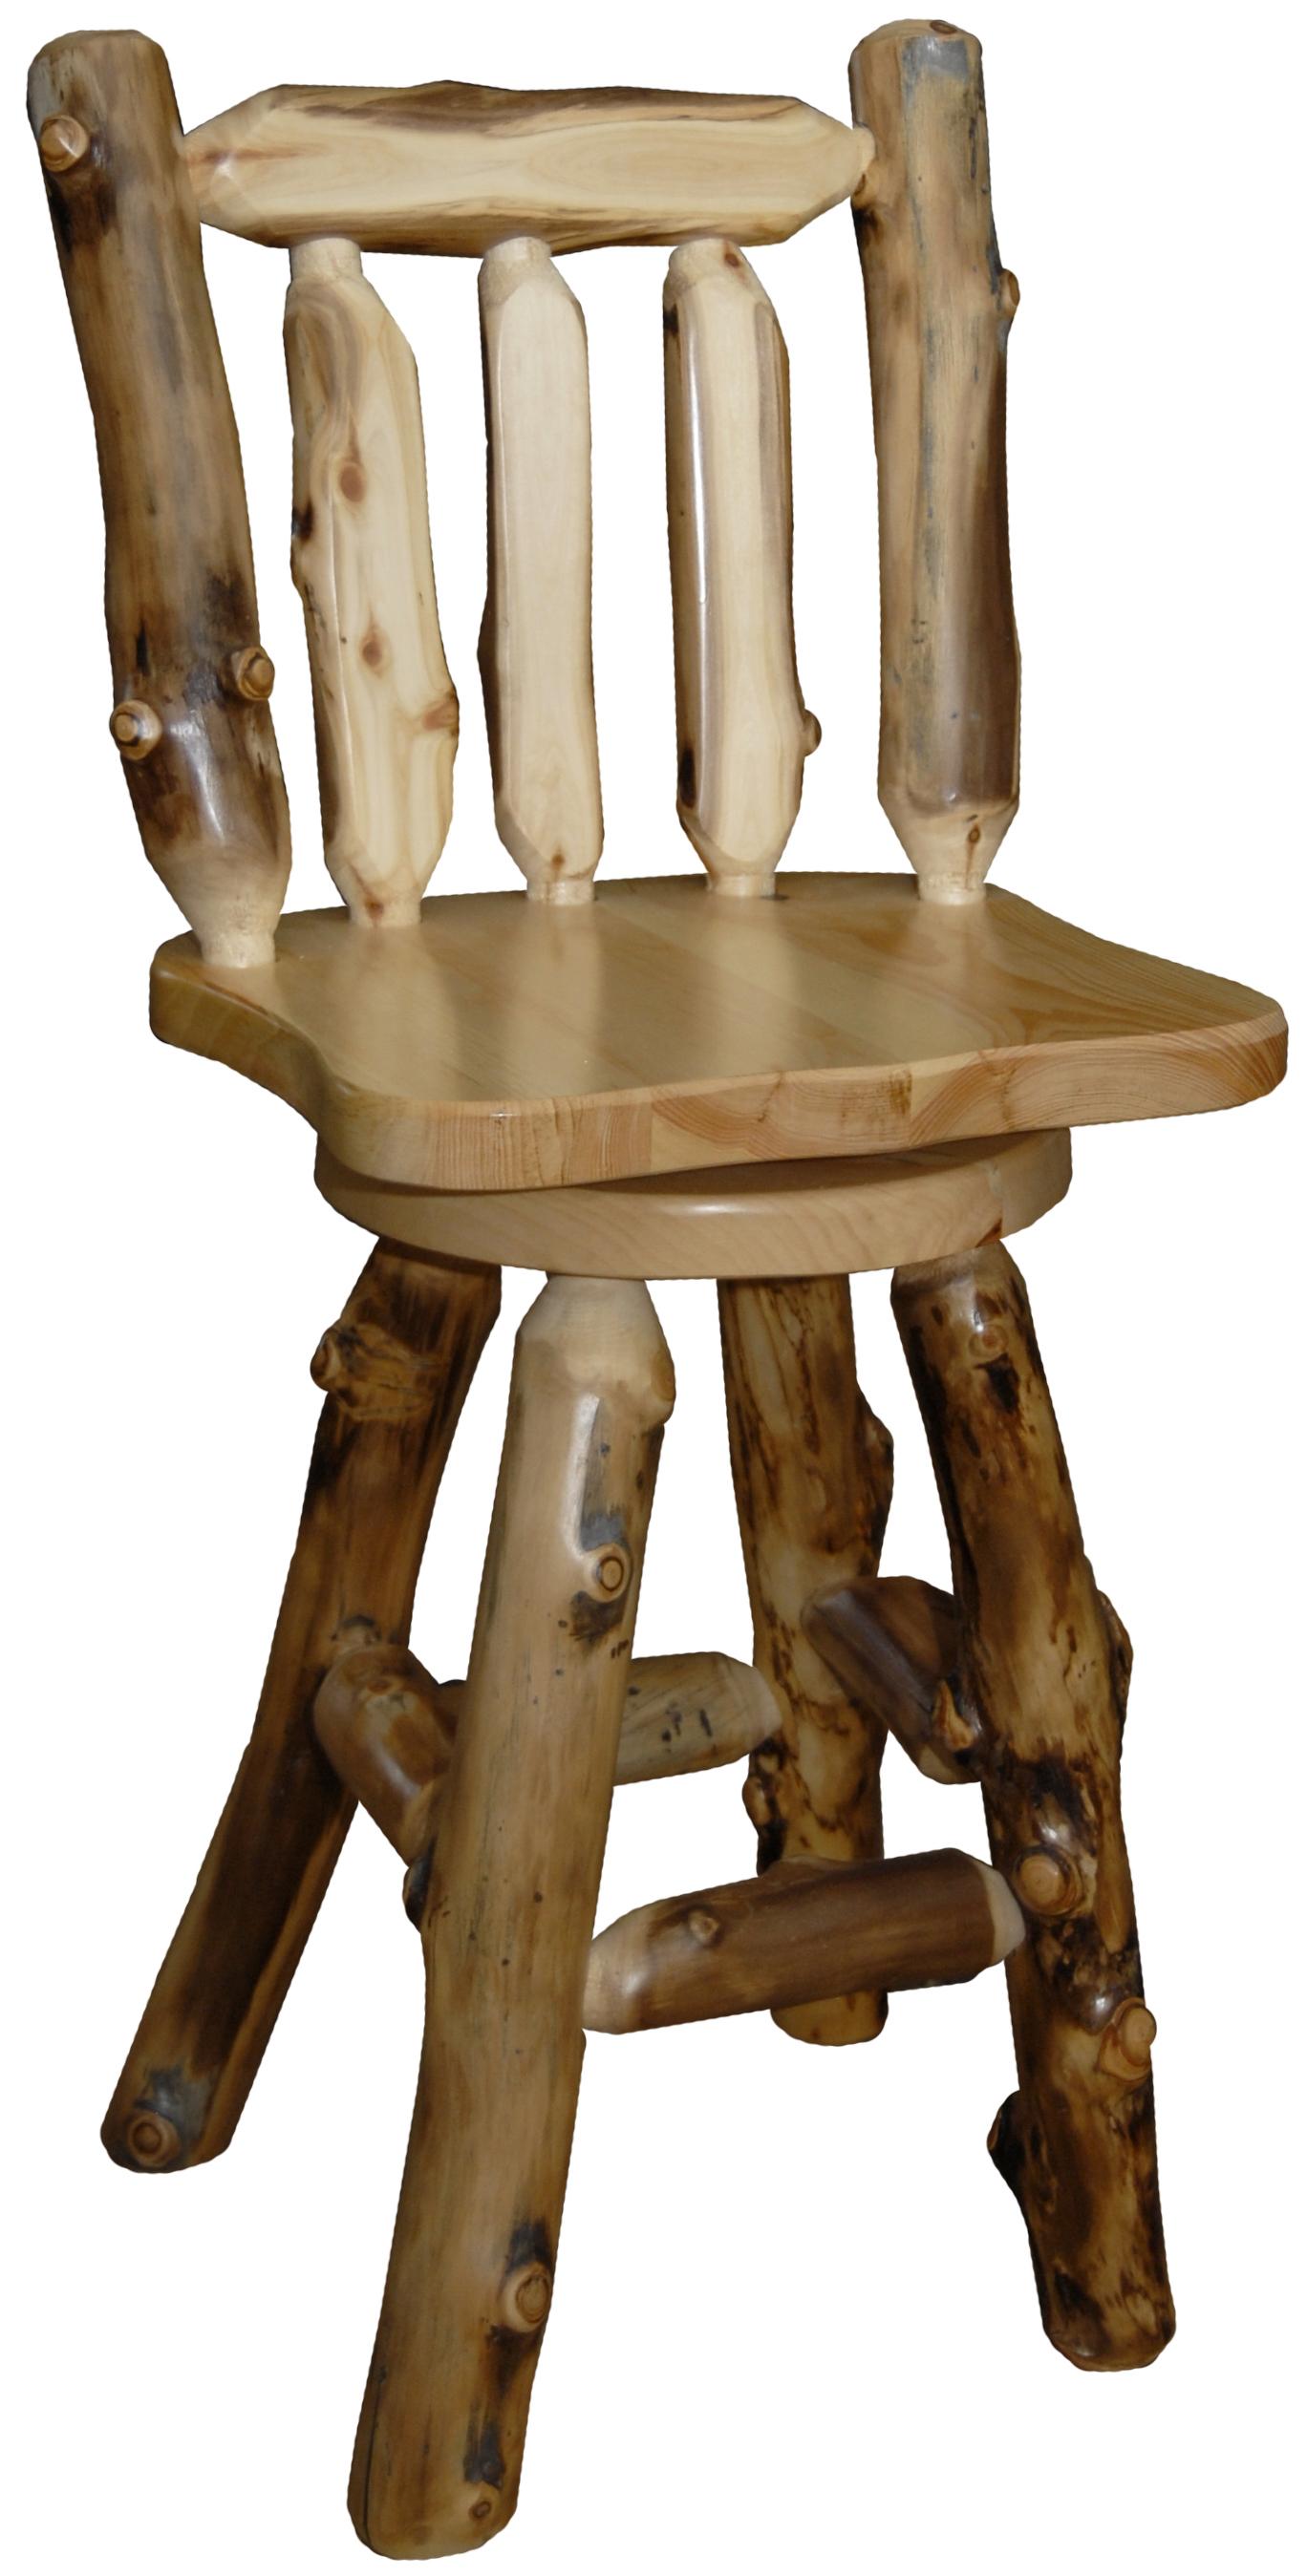 Aspen Swivel Chairs Regarding Most Recent Aspen Swivel Log Bar Stool (Gallery 11 of 20)